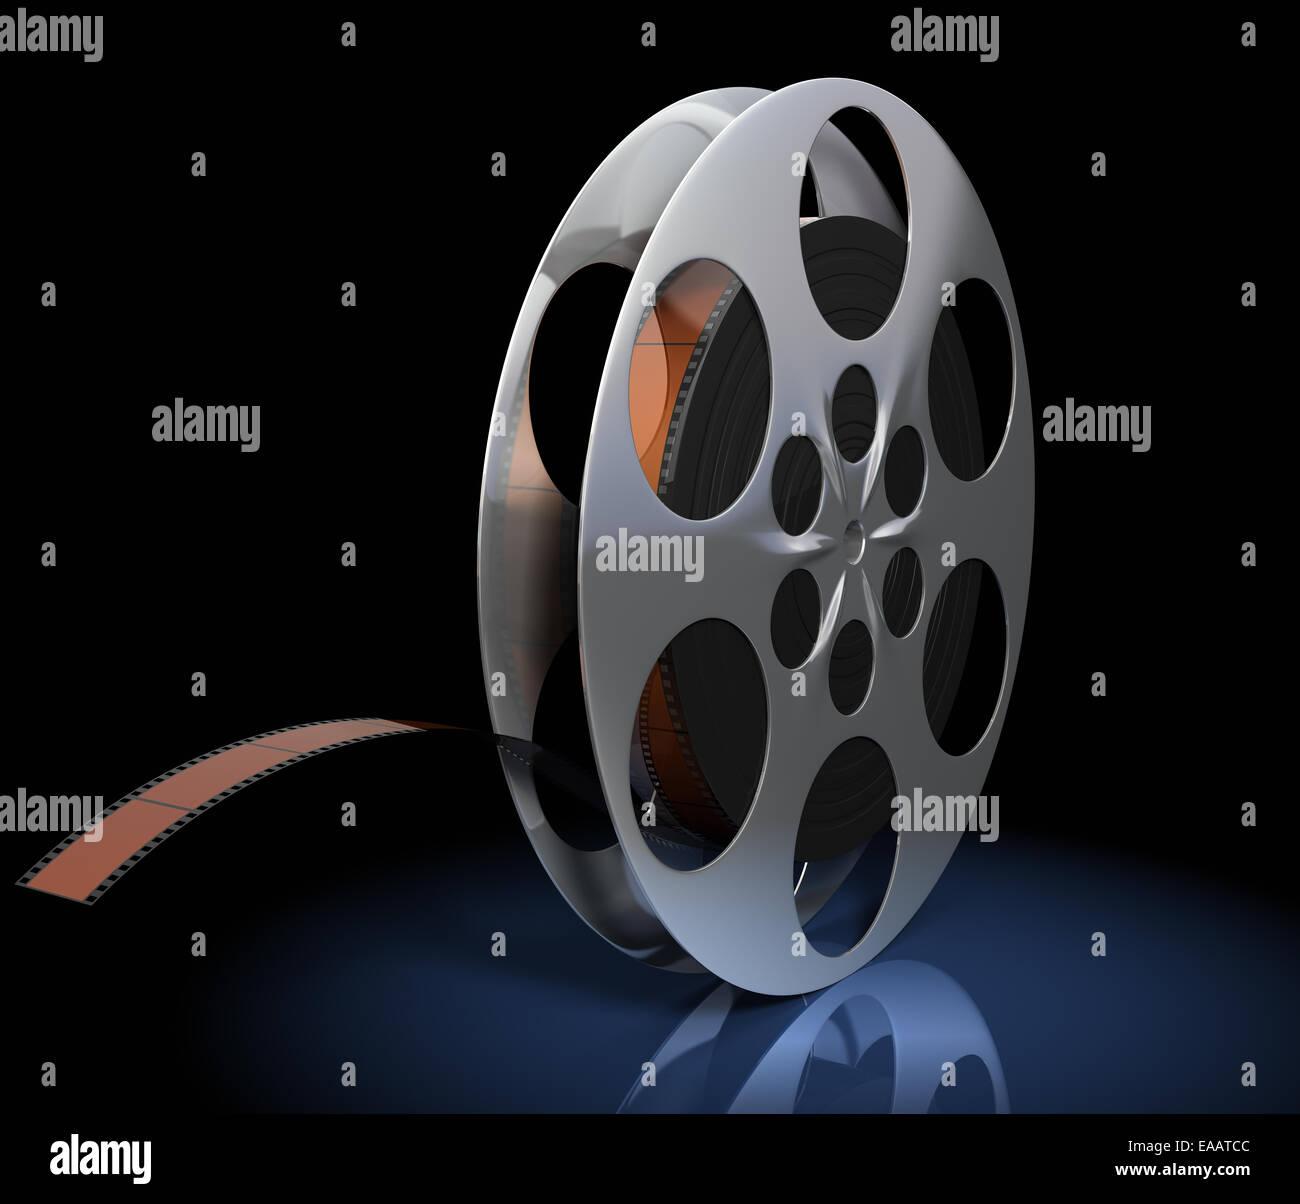 Film reel on black background - Stock Image